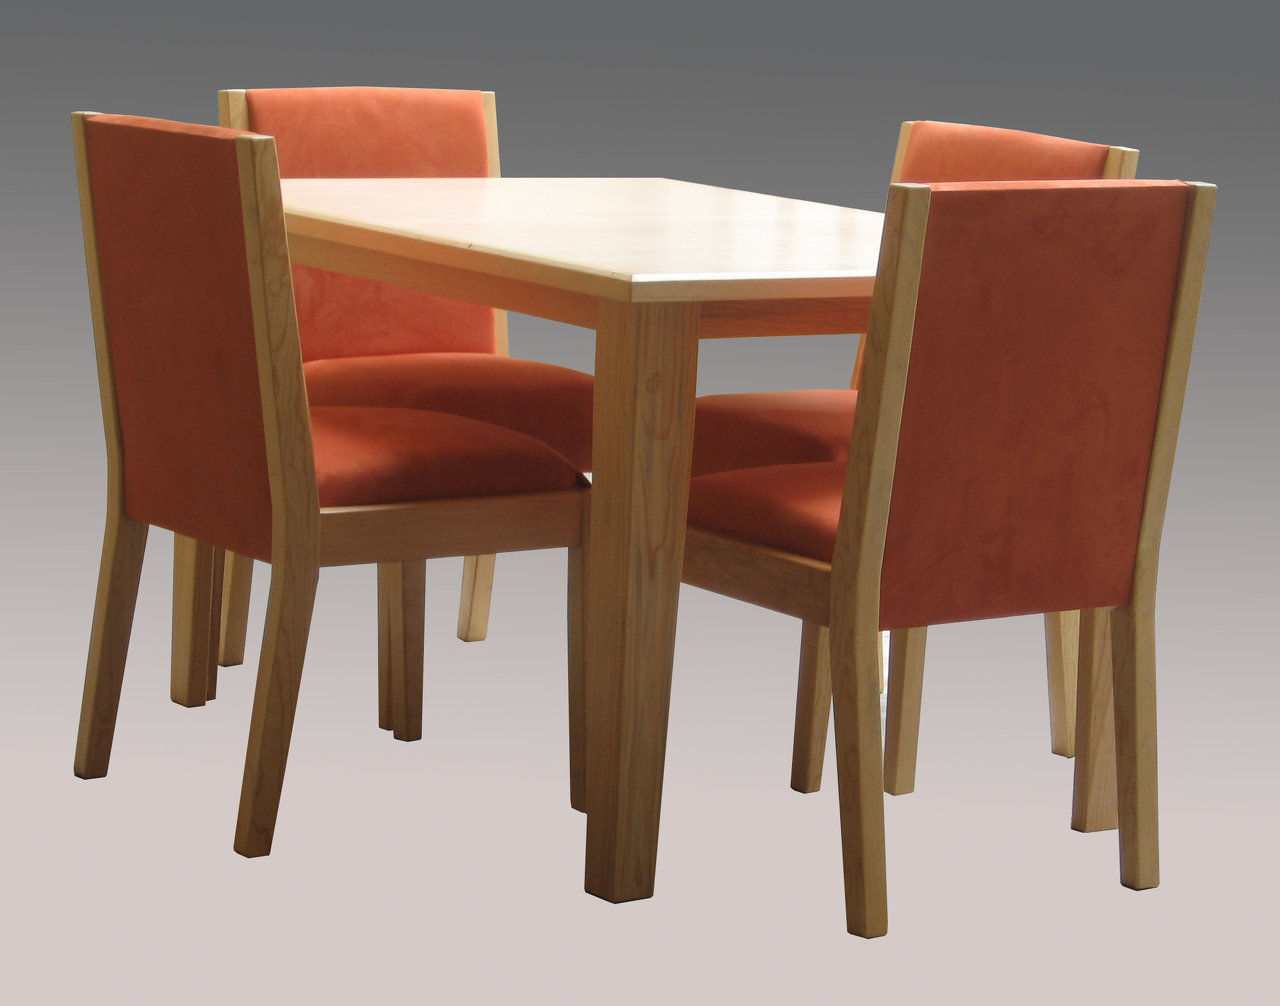 Muebles debuenaraiz comedores salas complementos gran for Comedores modernos mexico df